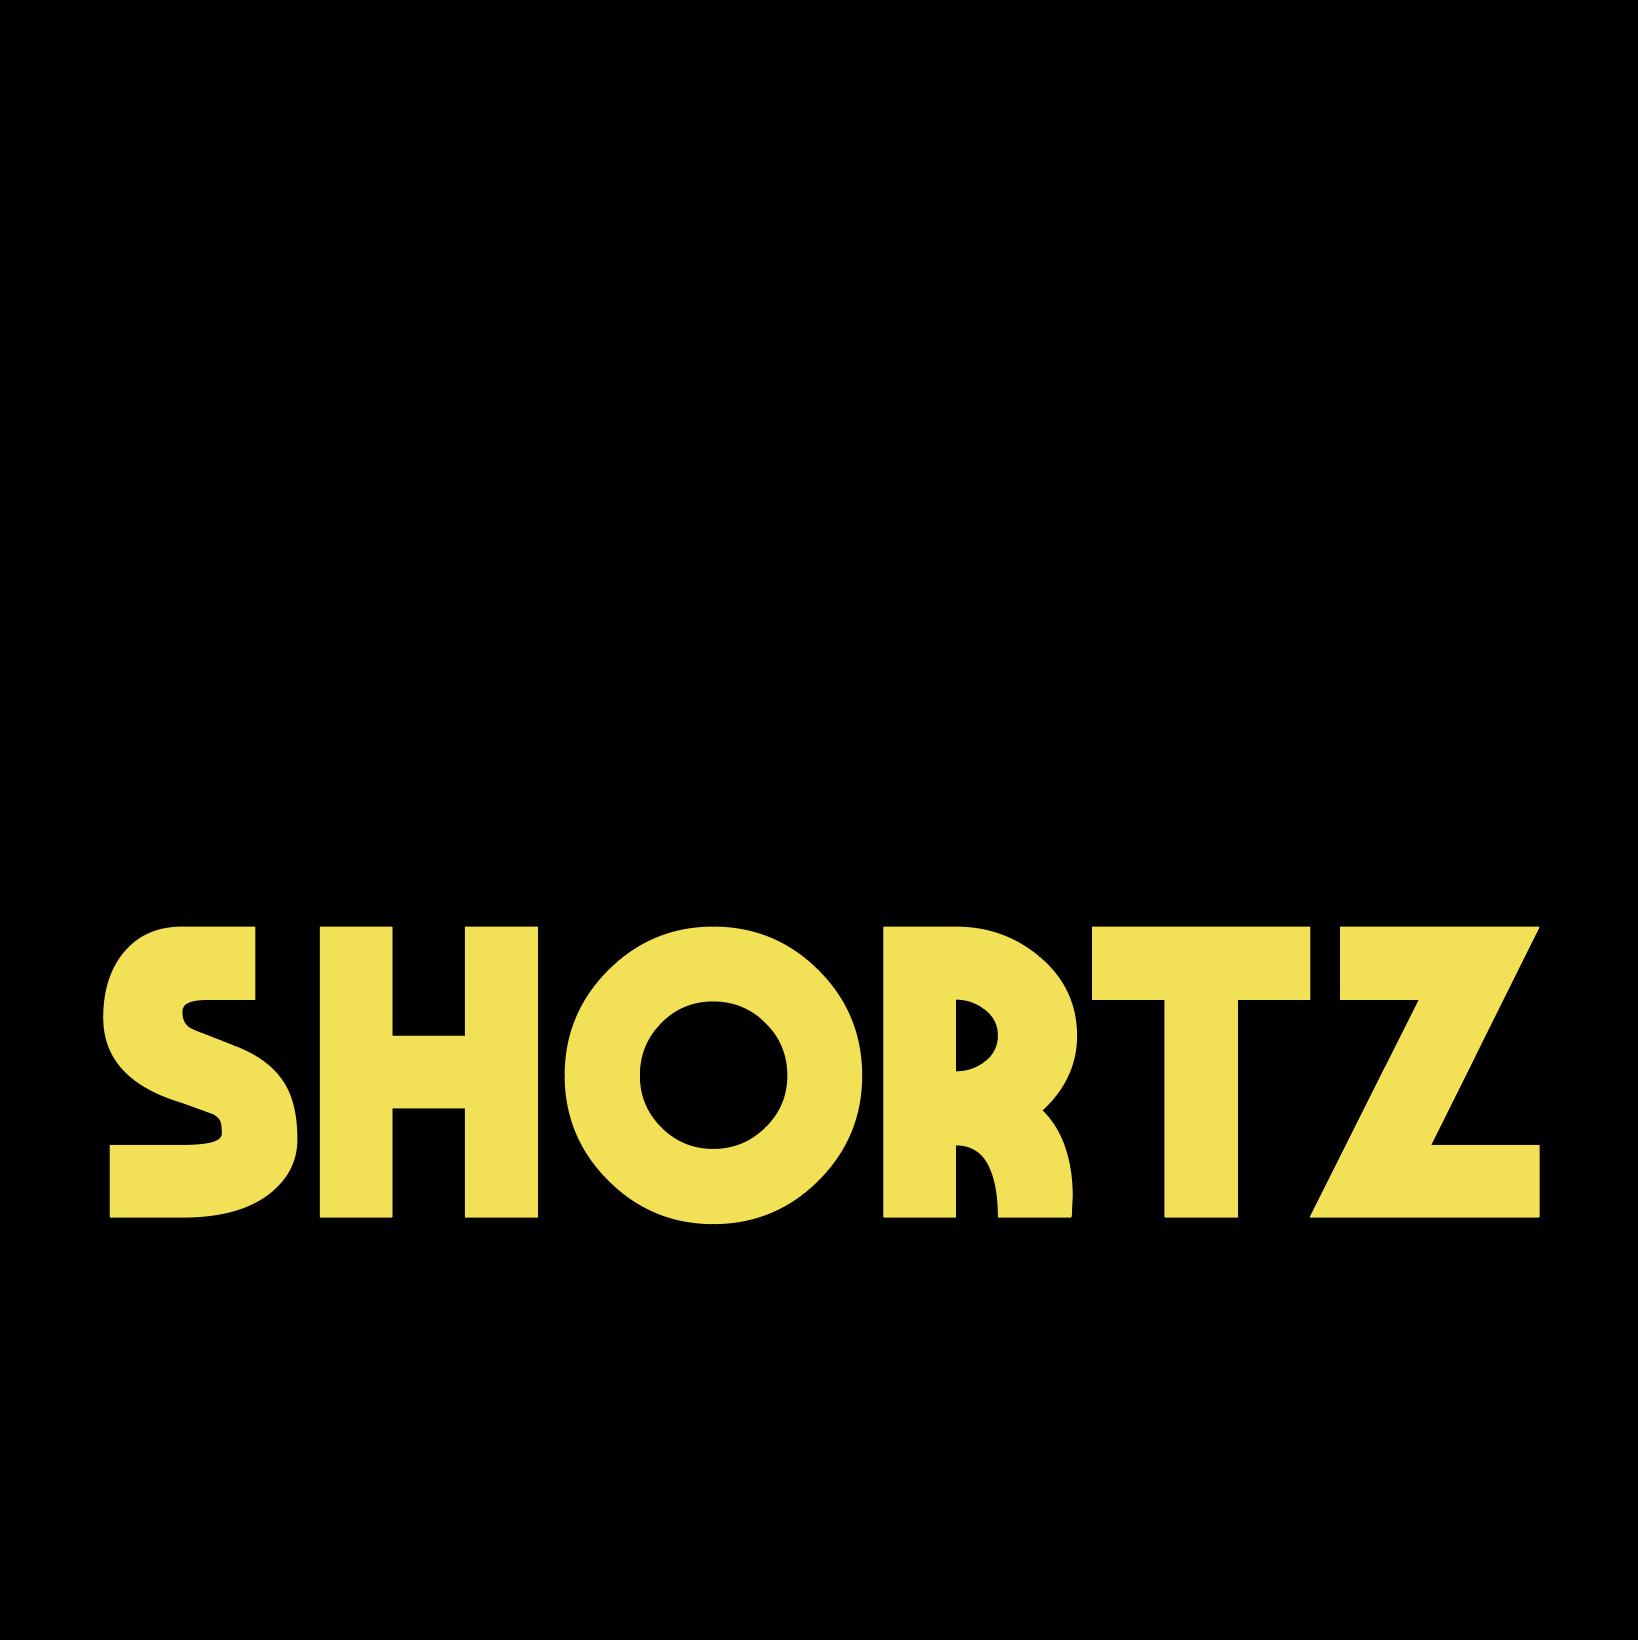 Shortz